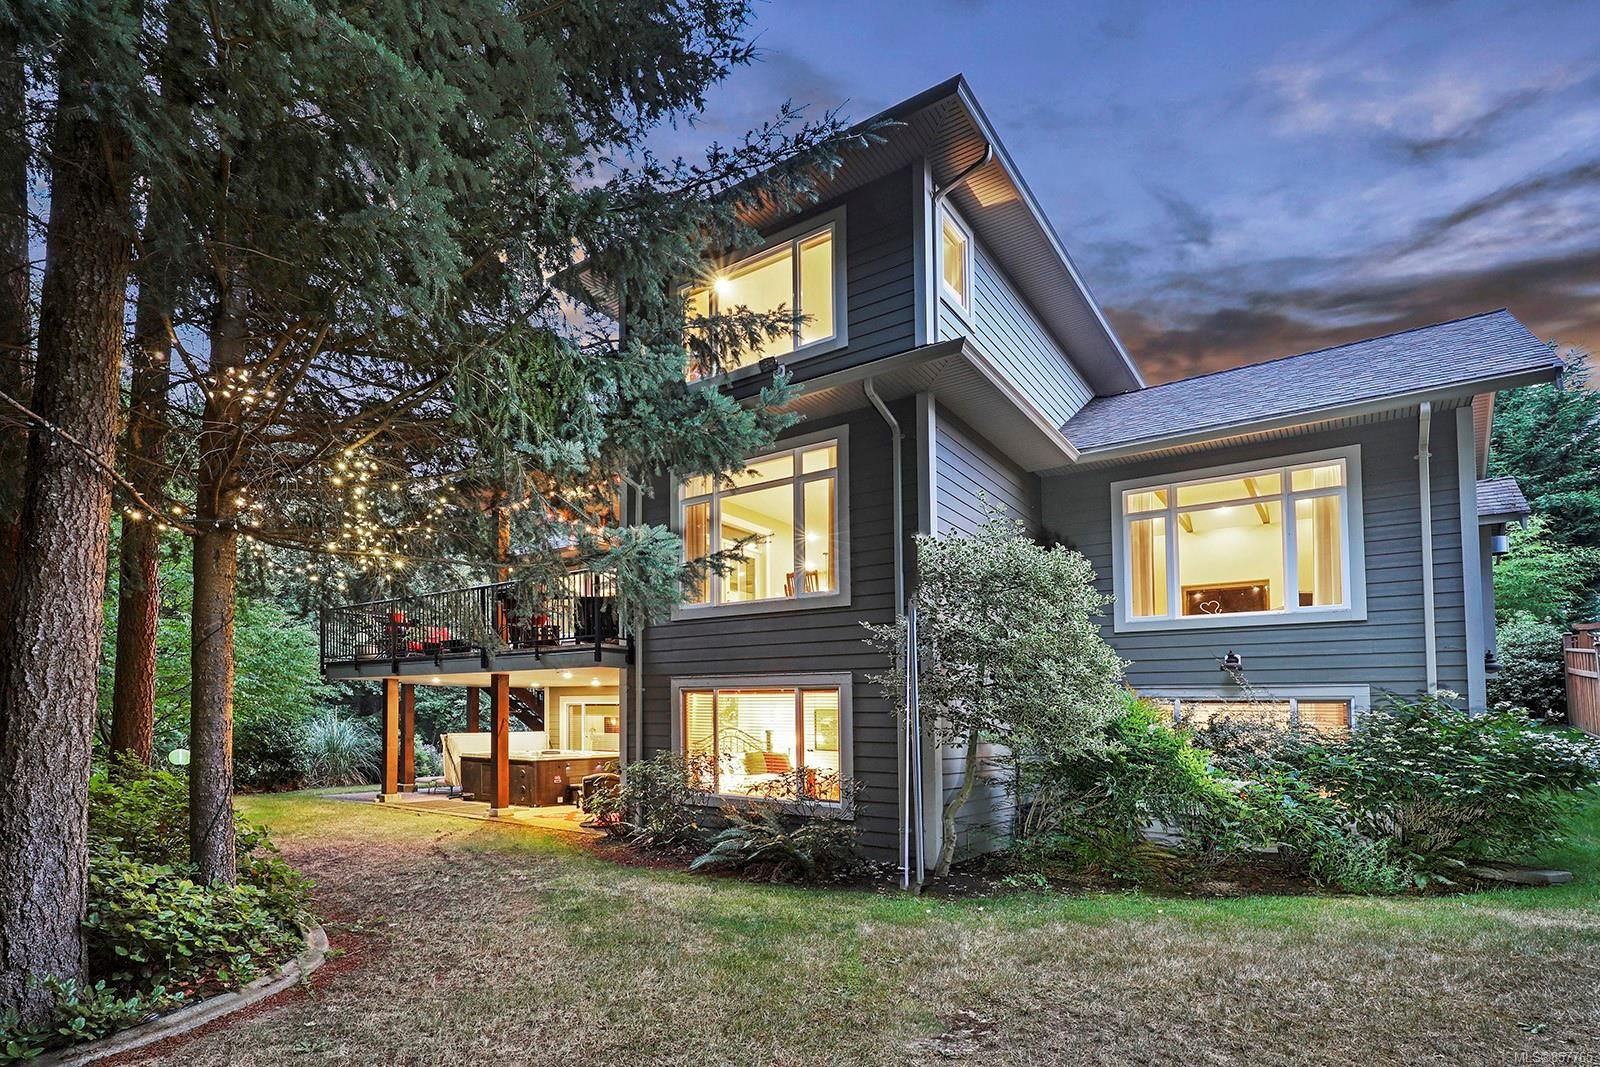 Photo 43: Photos: 1516 Highridge Dr in : CV Comox (Town of) House for sale (Comox Valley)  : MLS®# 857765